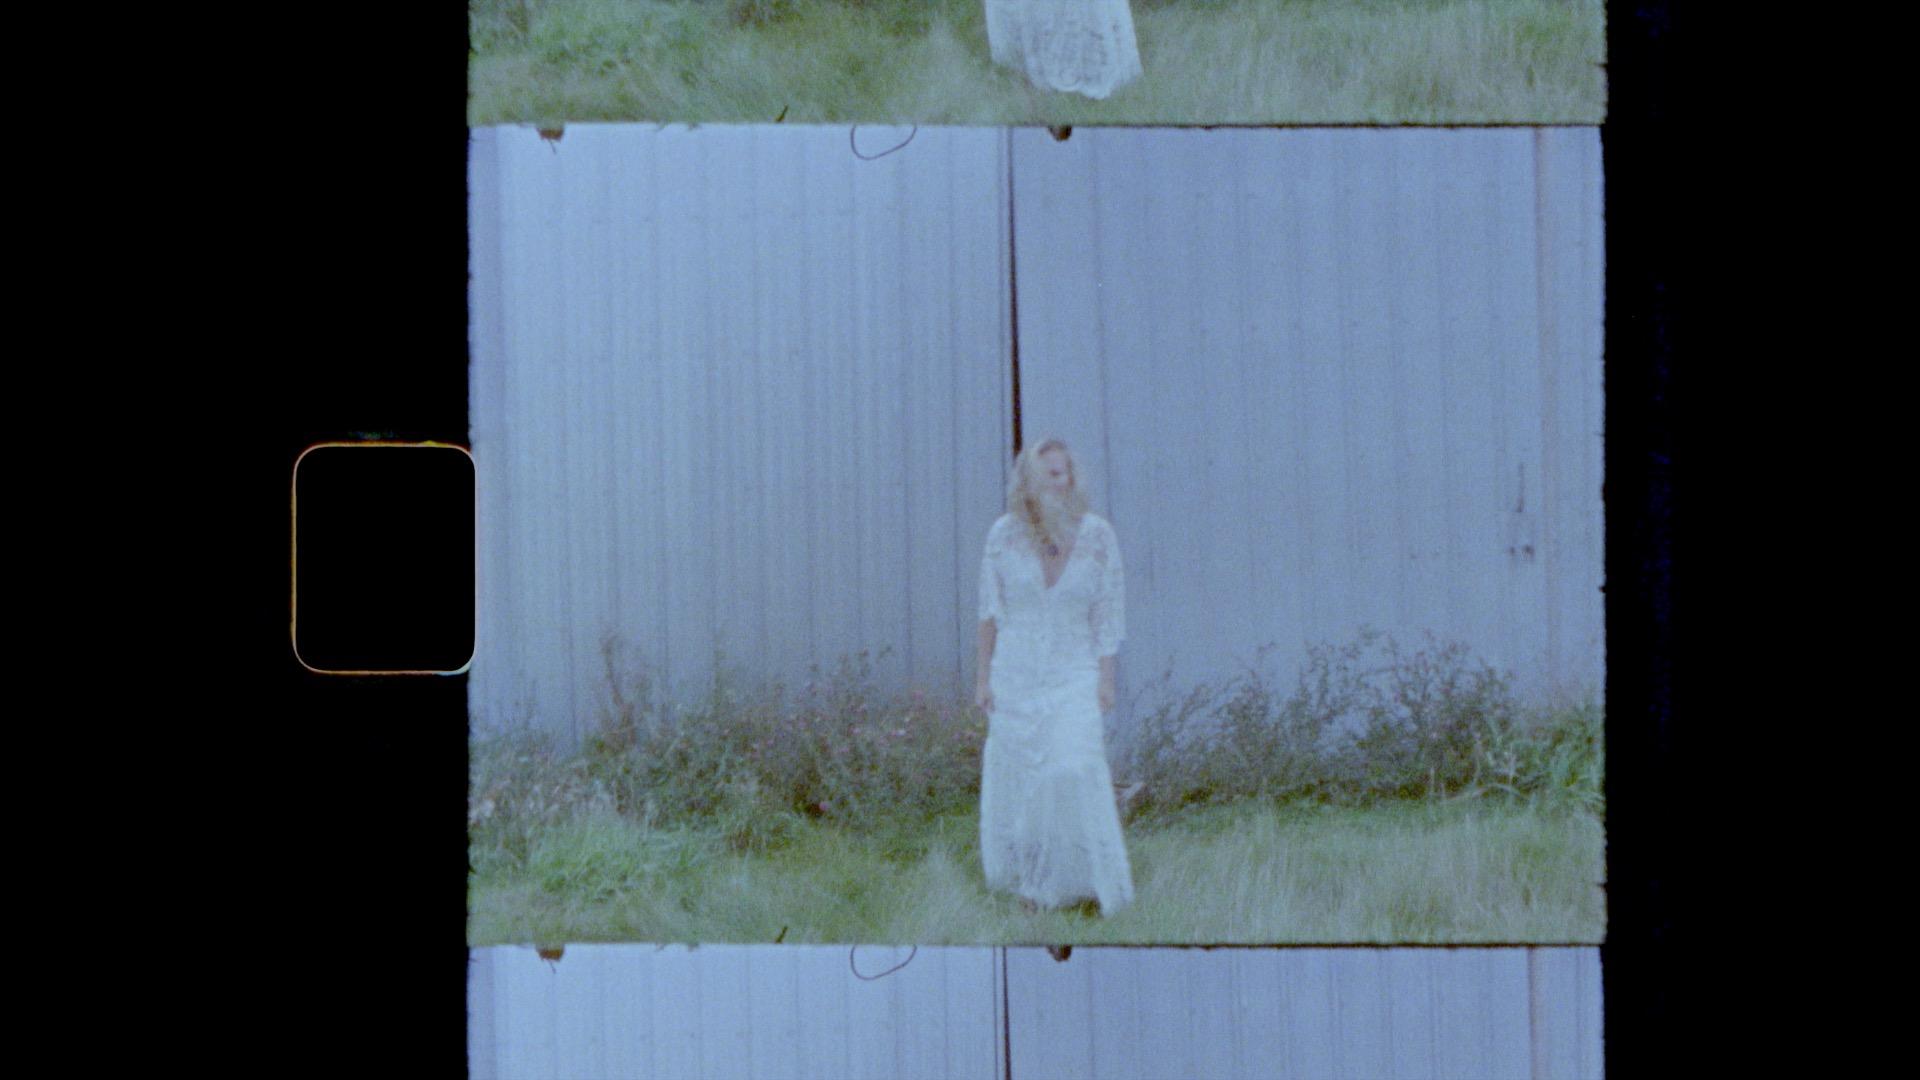 SUPER_8_FILMS1019.JPG